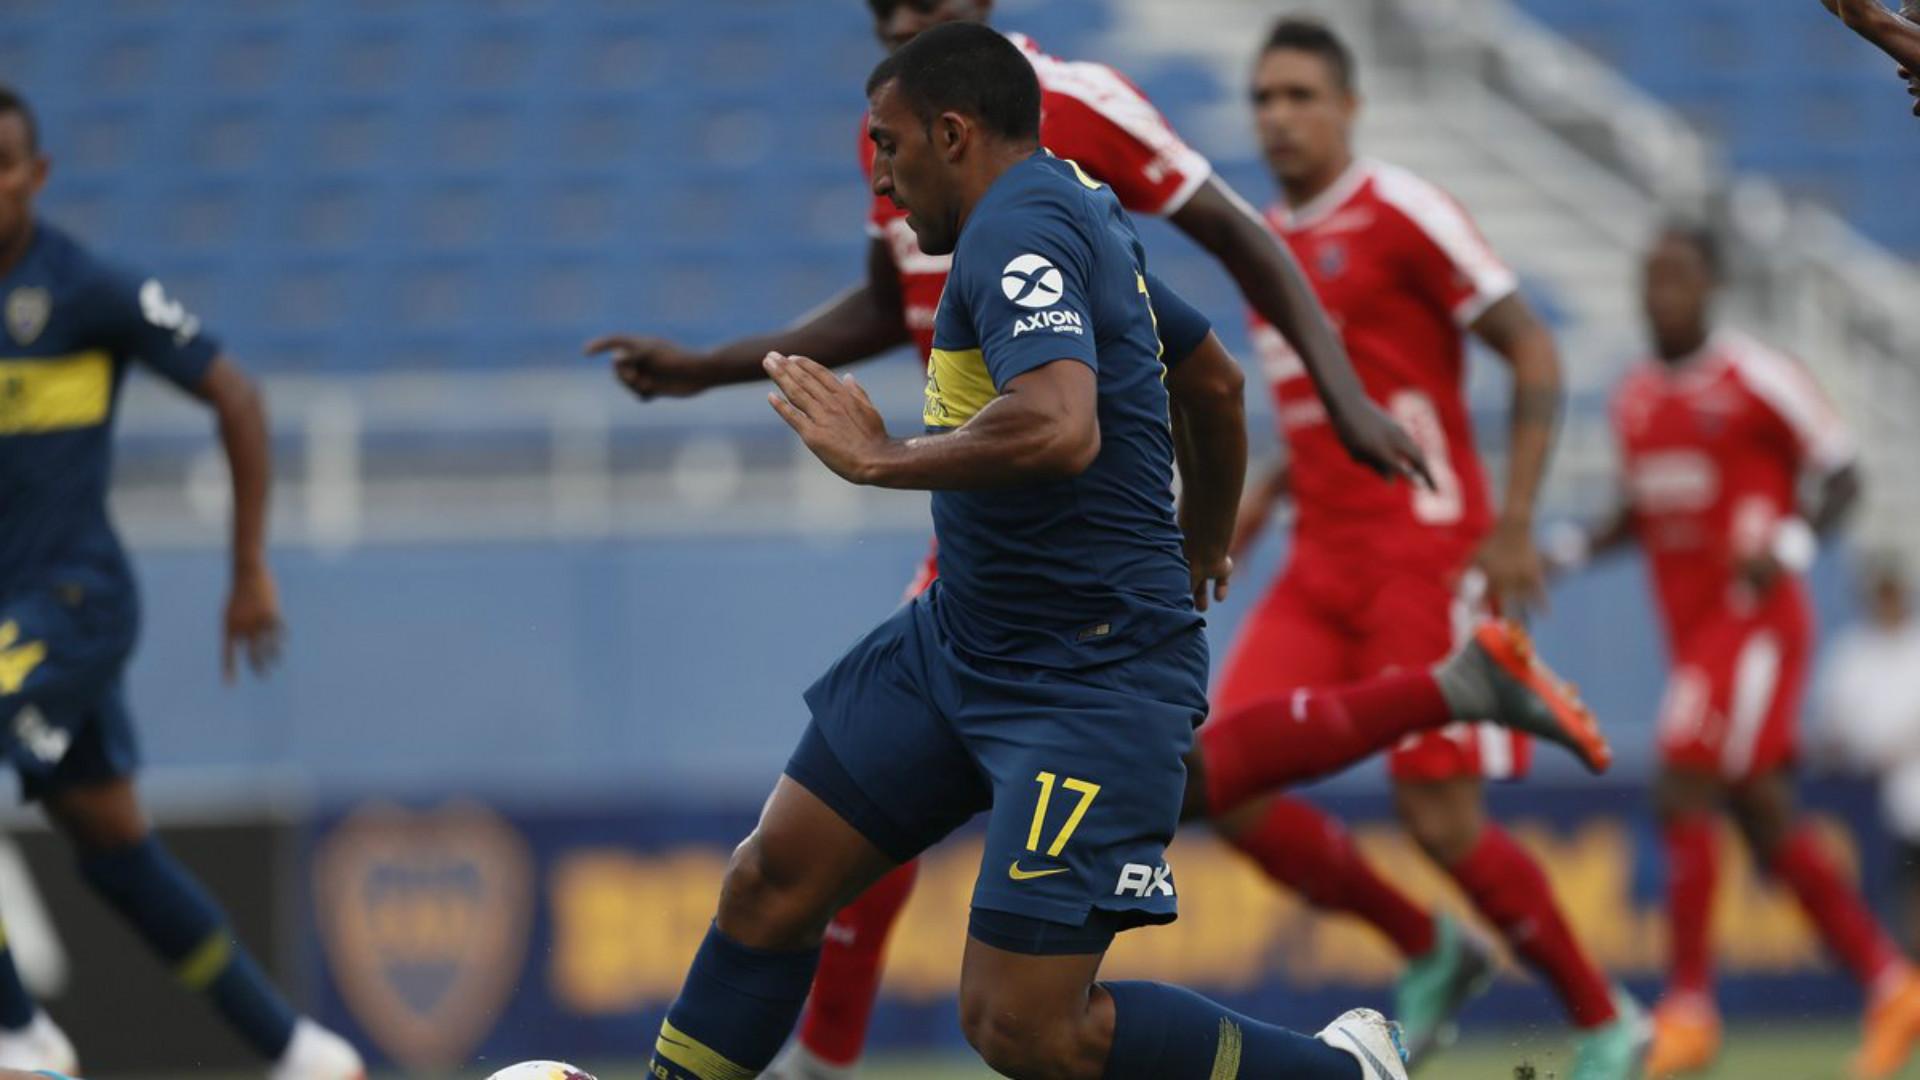 Wanchope Abila Boca Independiente Medellin Amistoso Pretemporada 2018